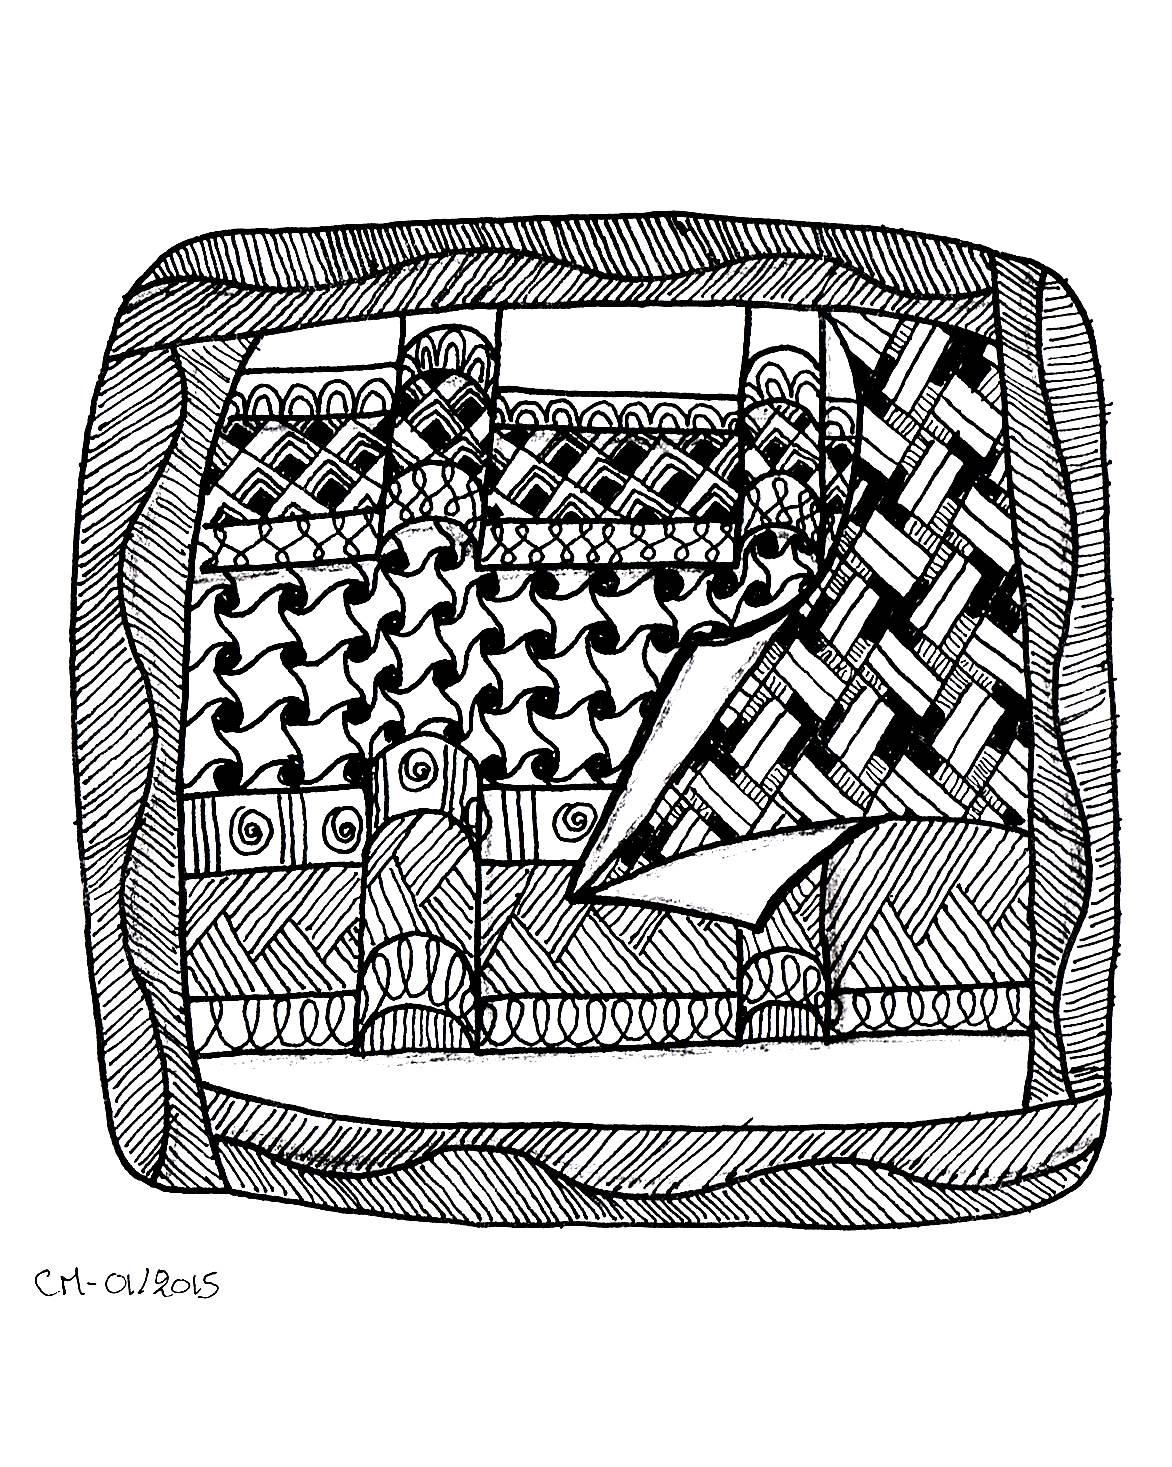 'Some tangles', coloriage original  Voir l'oeuvre originale